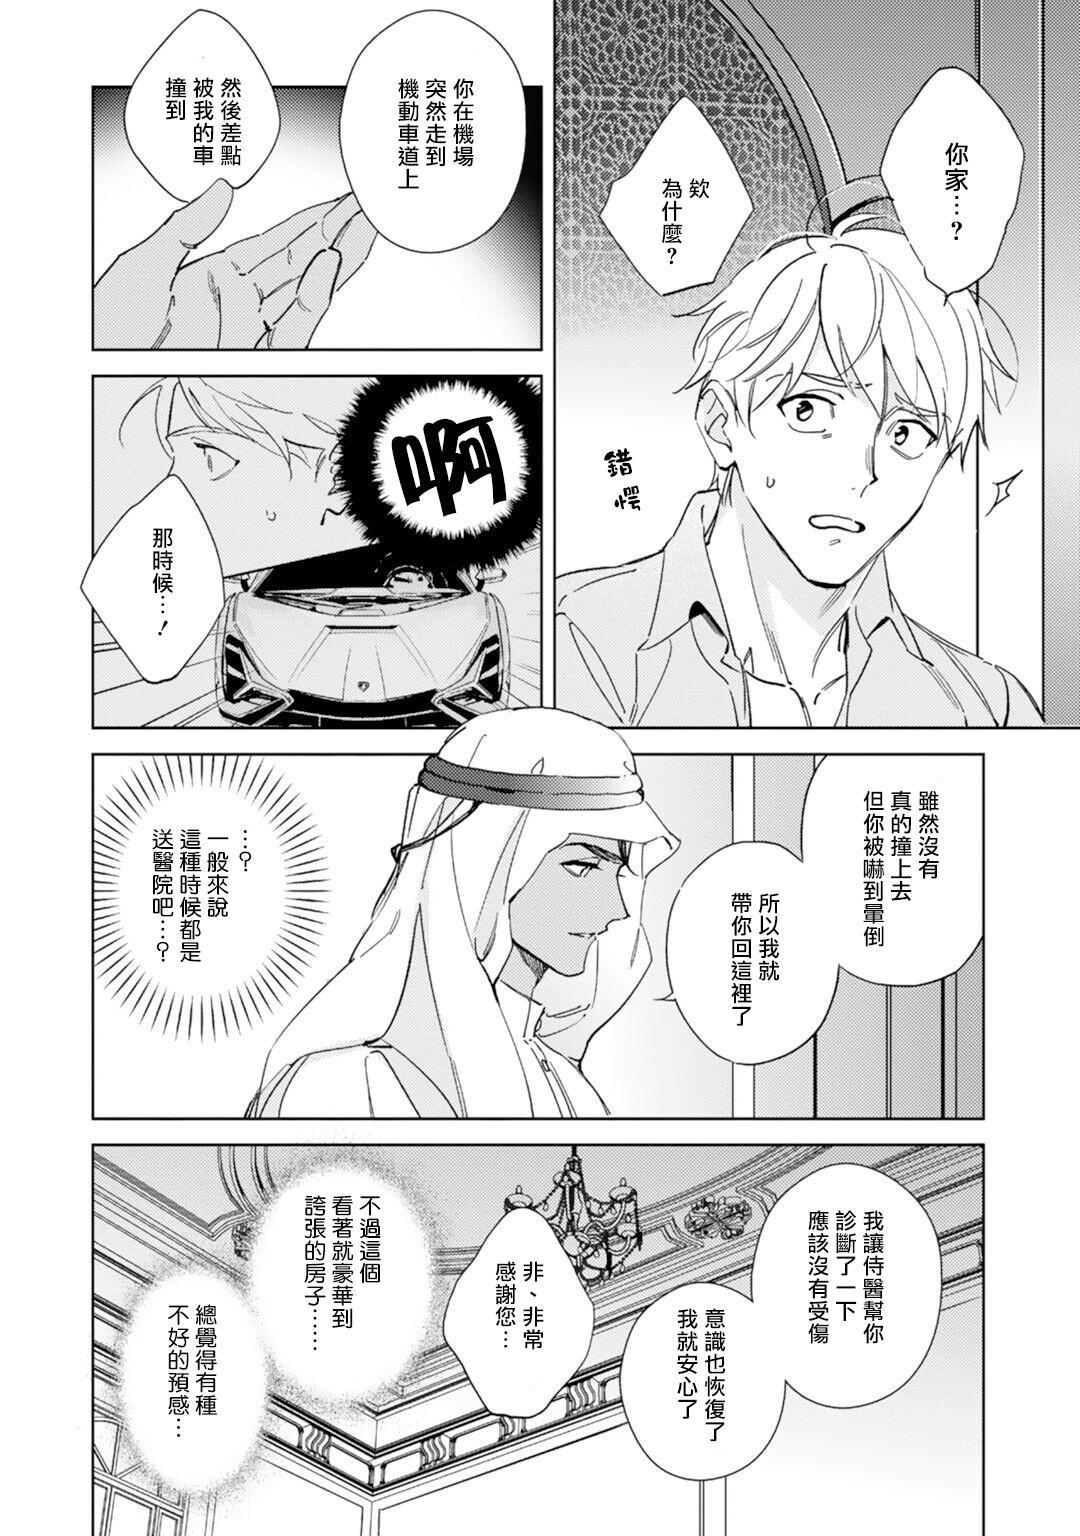 Amber Vanilla no Hanayome | 琥珀香草的新娘 Ch. 1-3 6